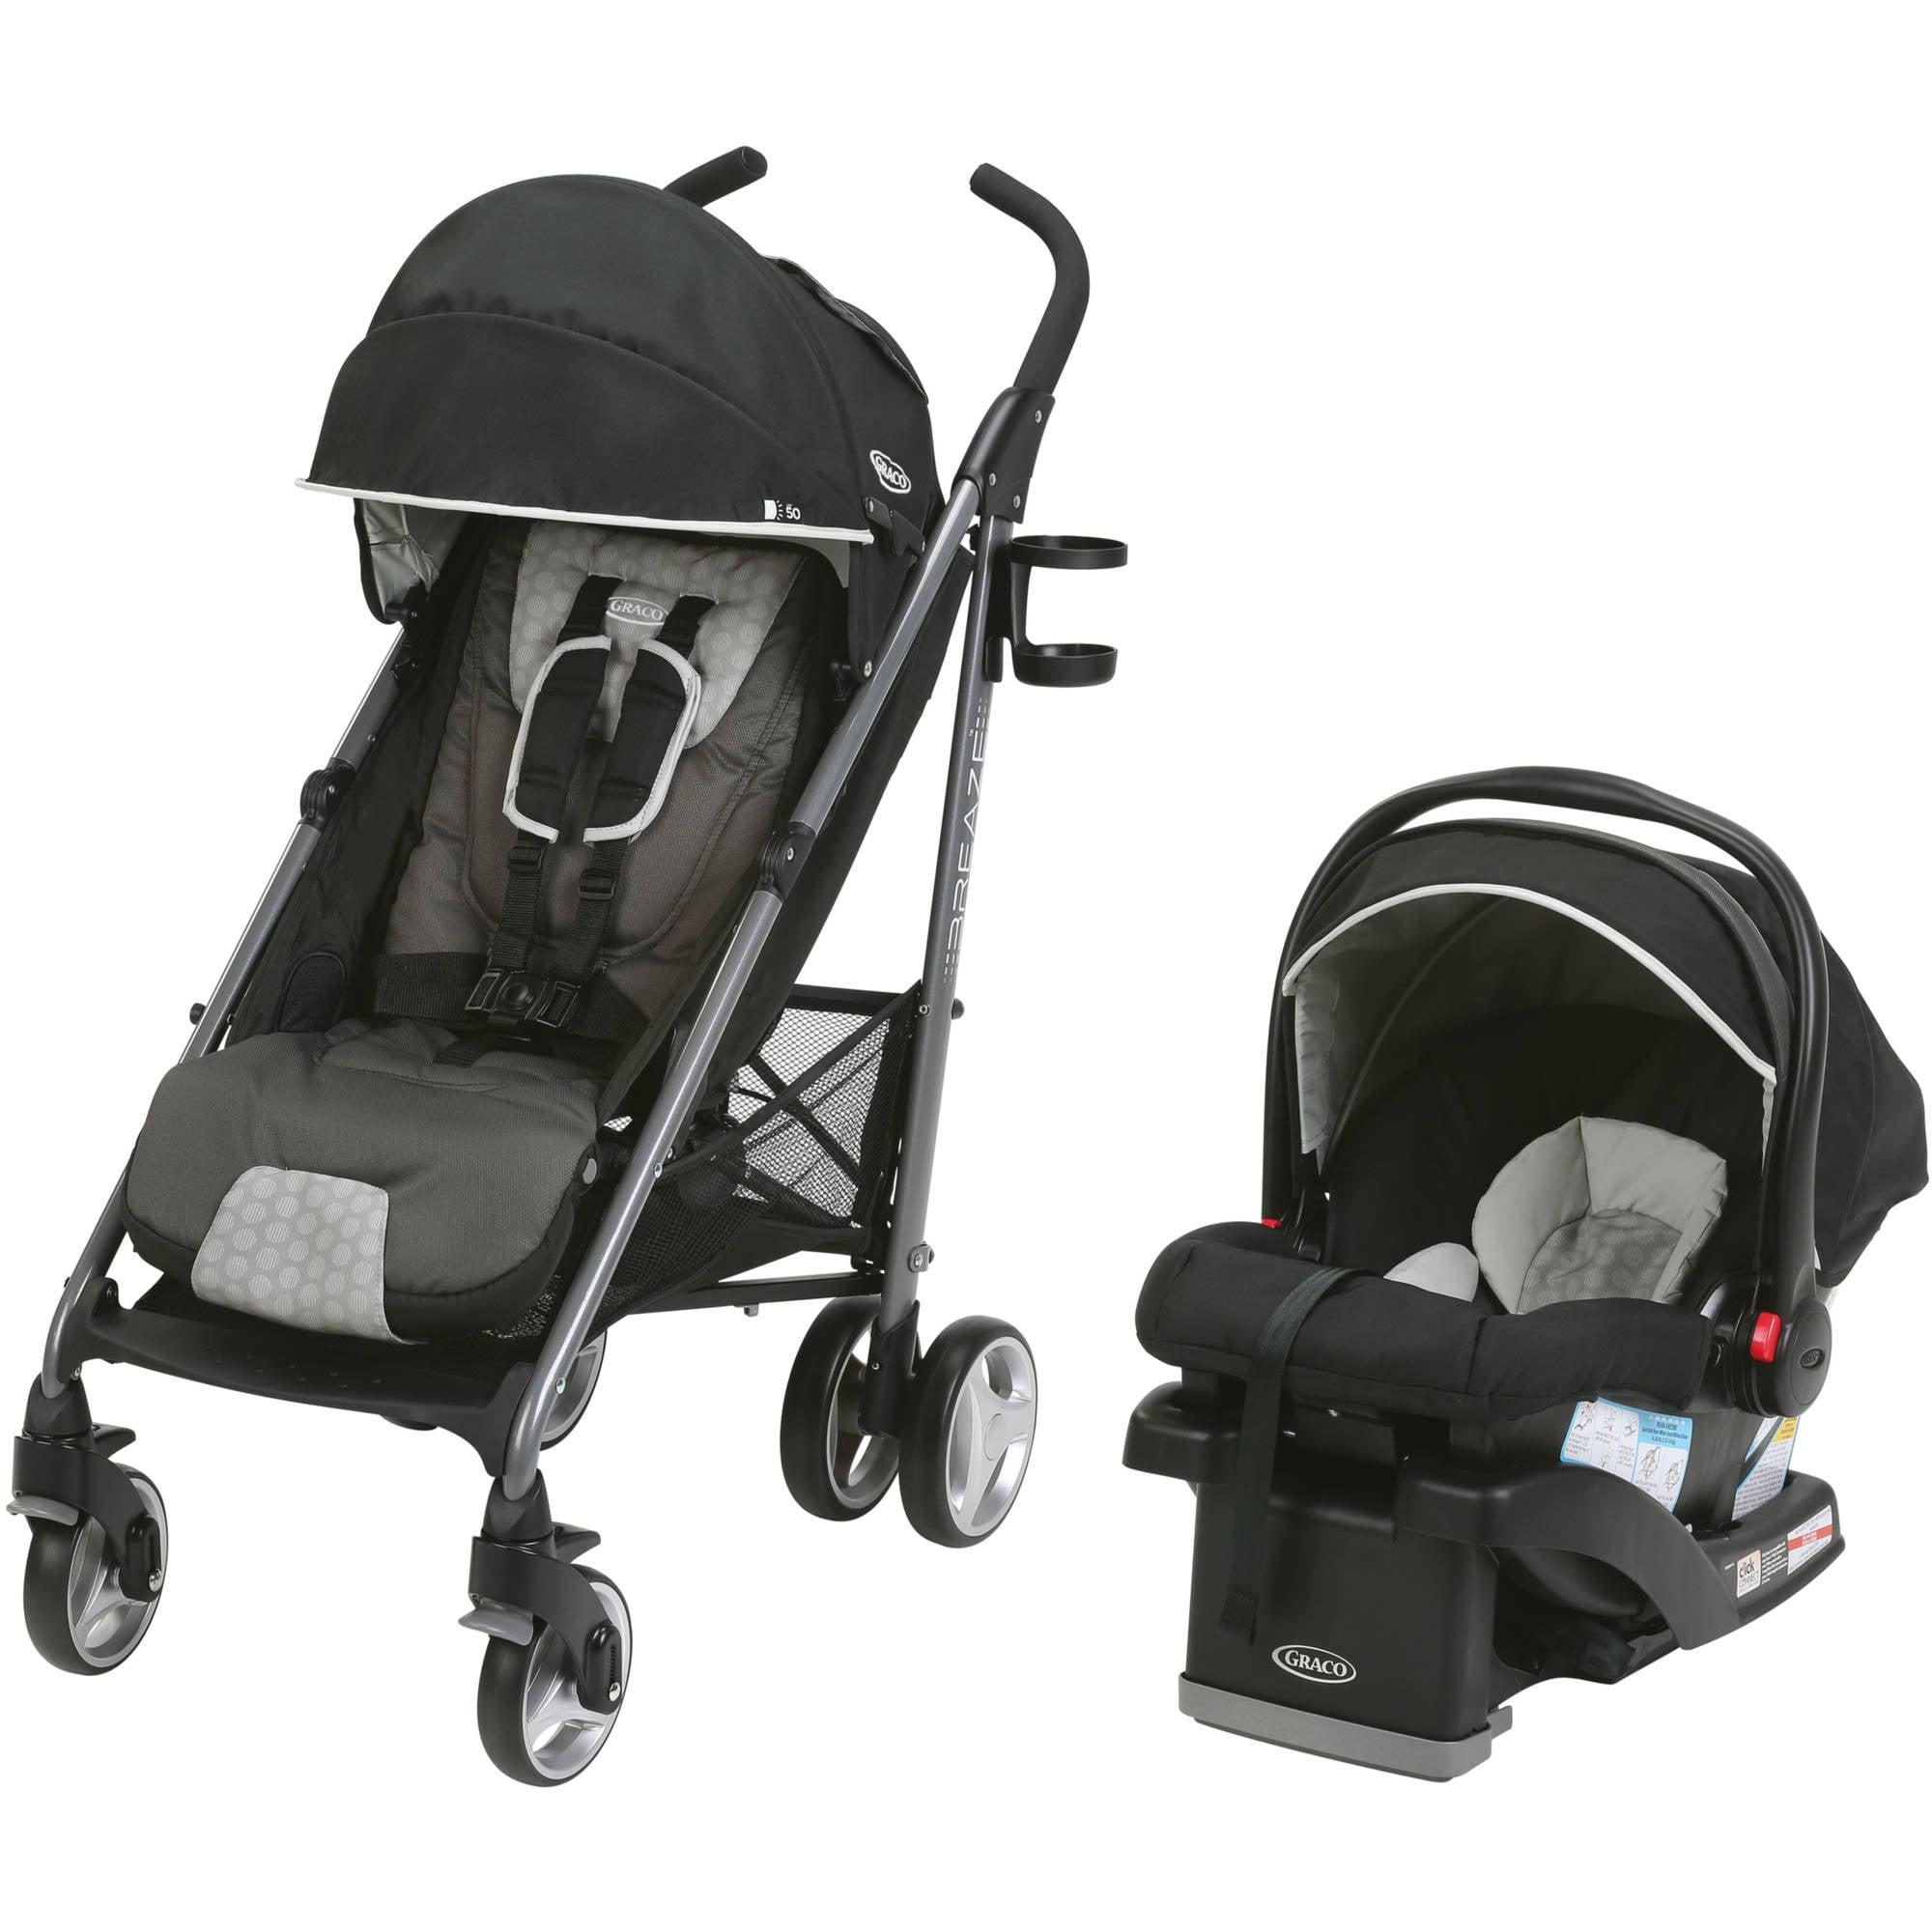 Graco Breaze Travel System Stroller with SnugRide Click Connect 35 Infant Car Seat, Davis